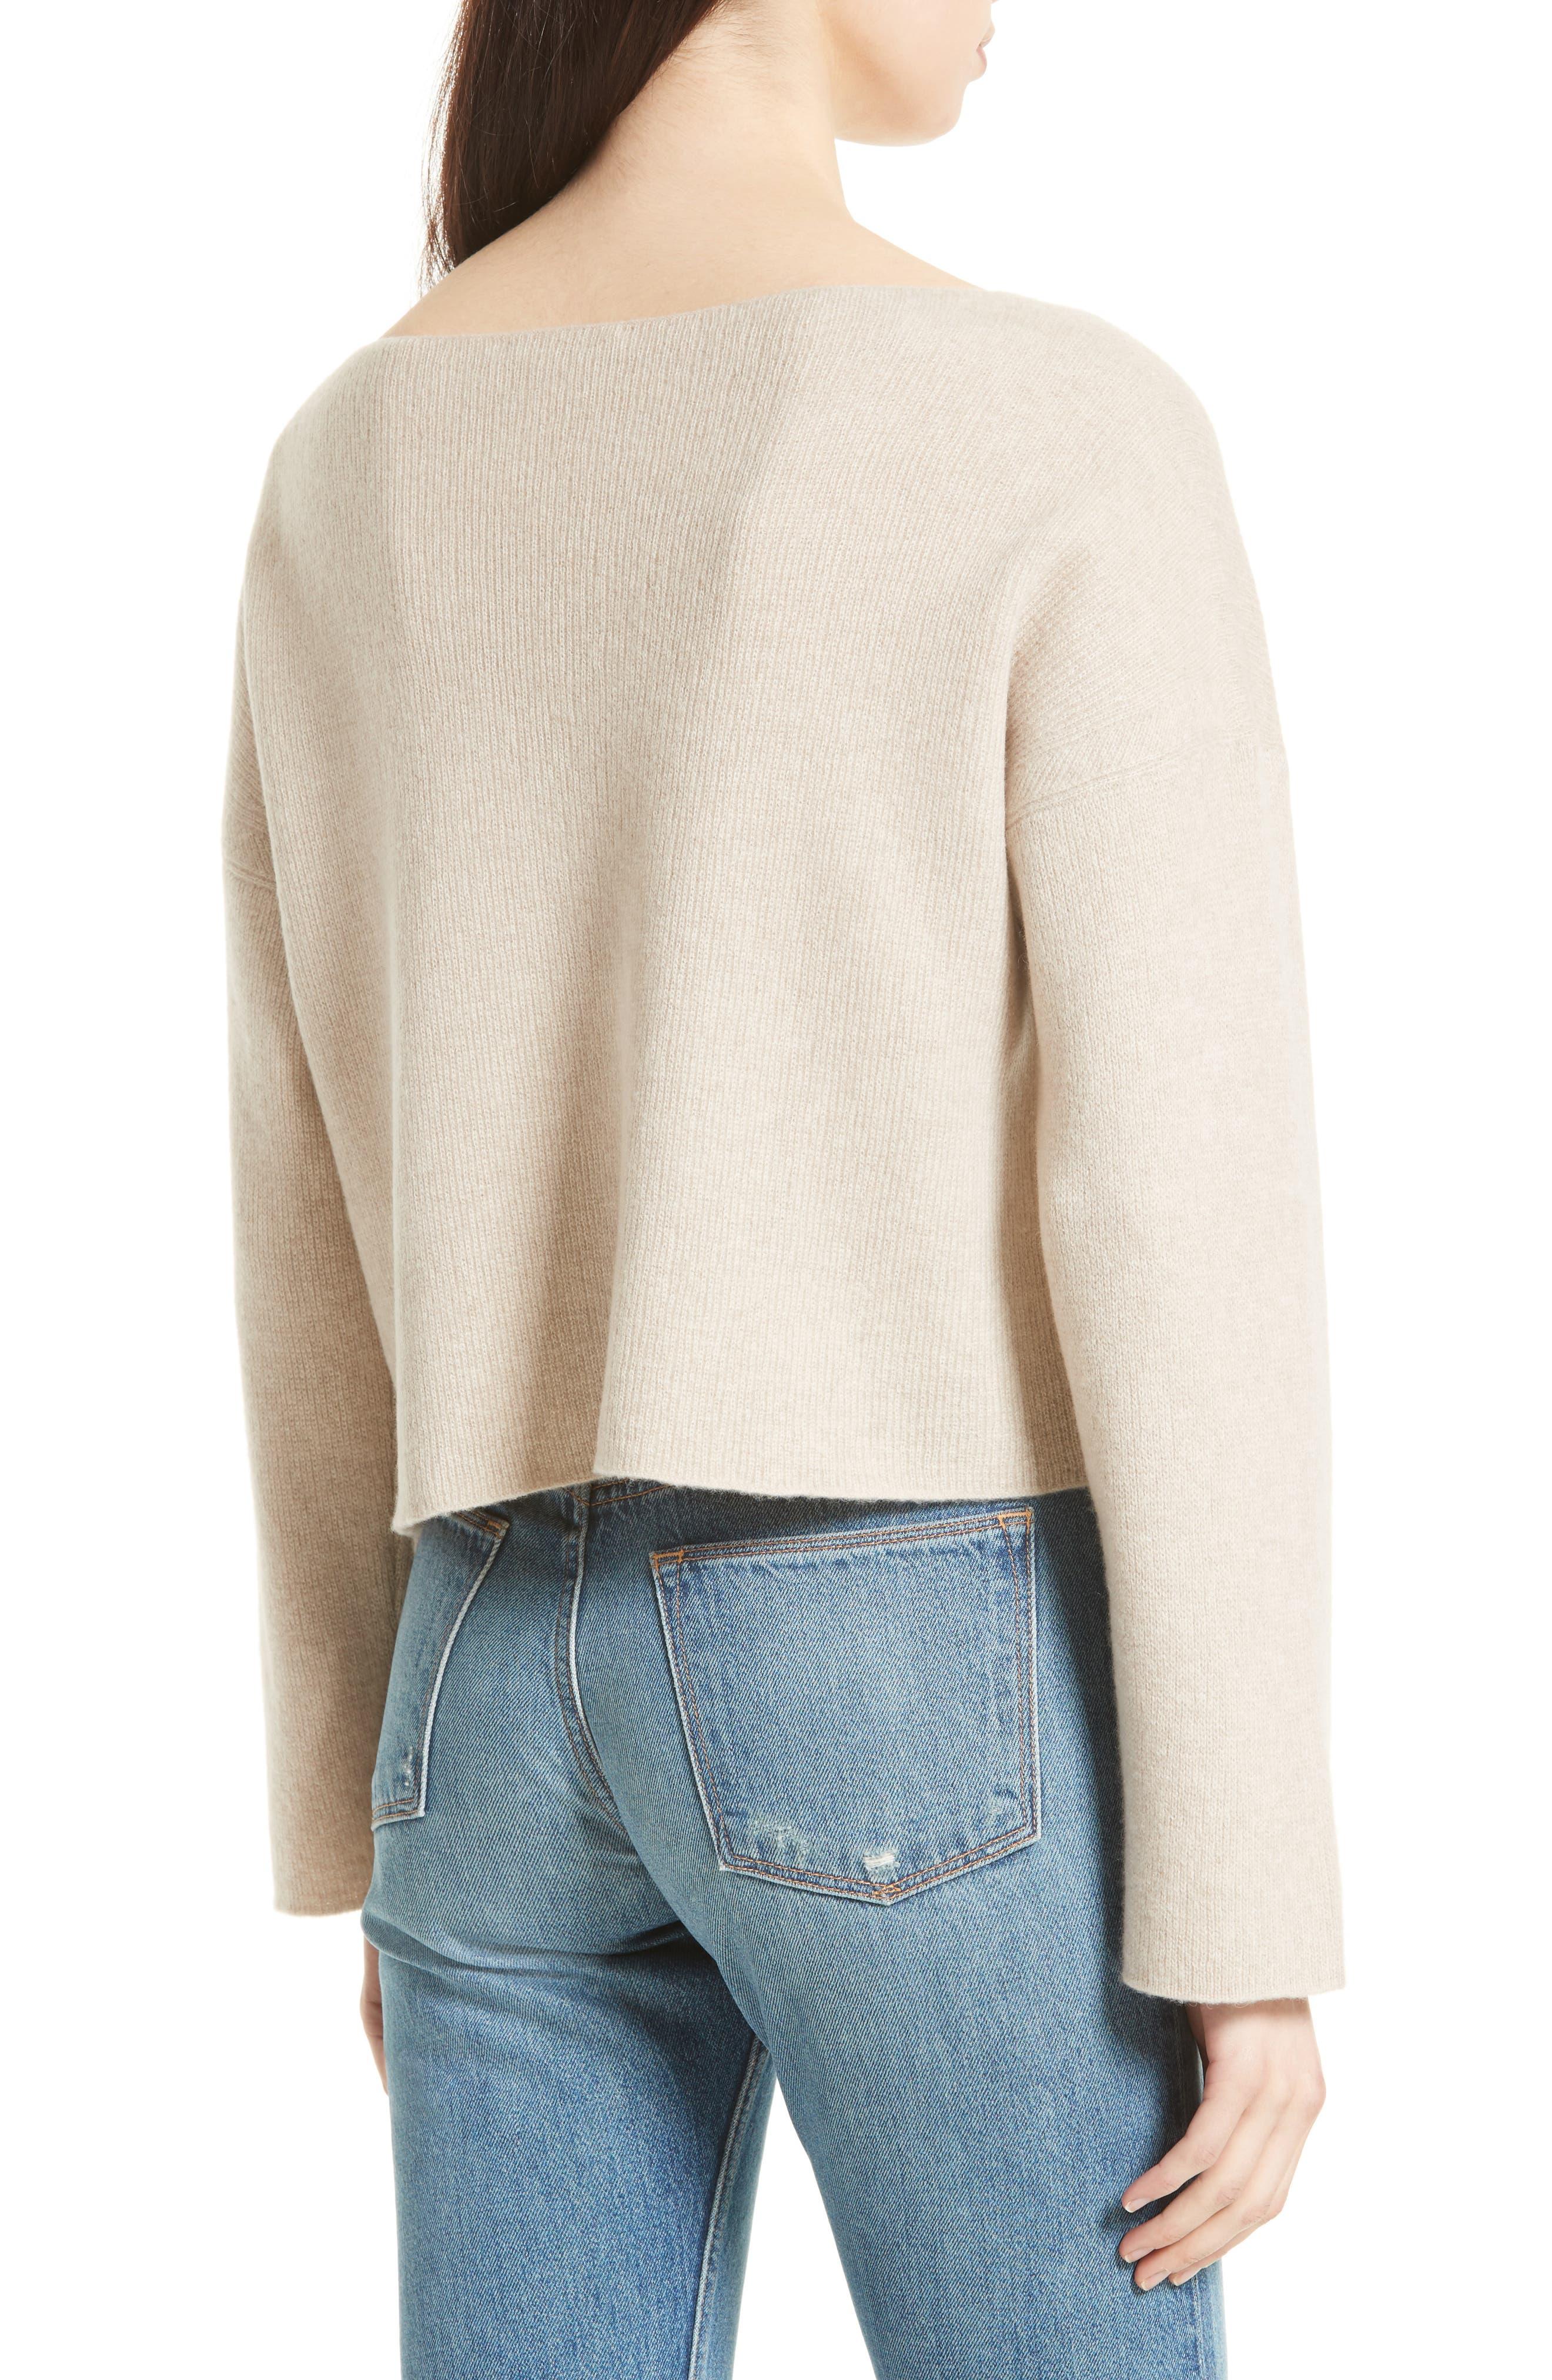 VINCE,                             Boxy Cashmere Sweater,                             Alternate thumbnail 2, color,                             233